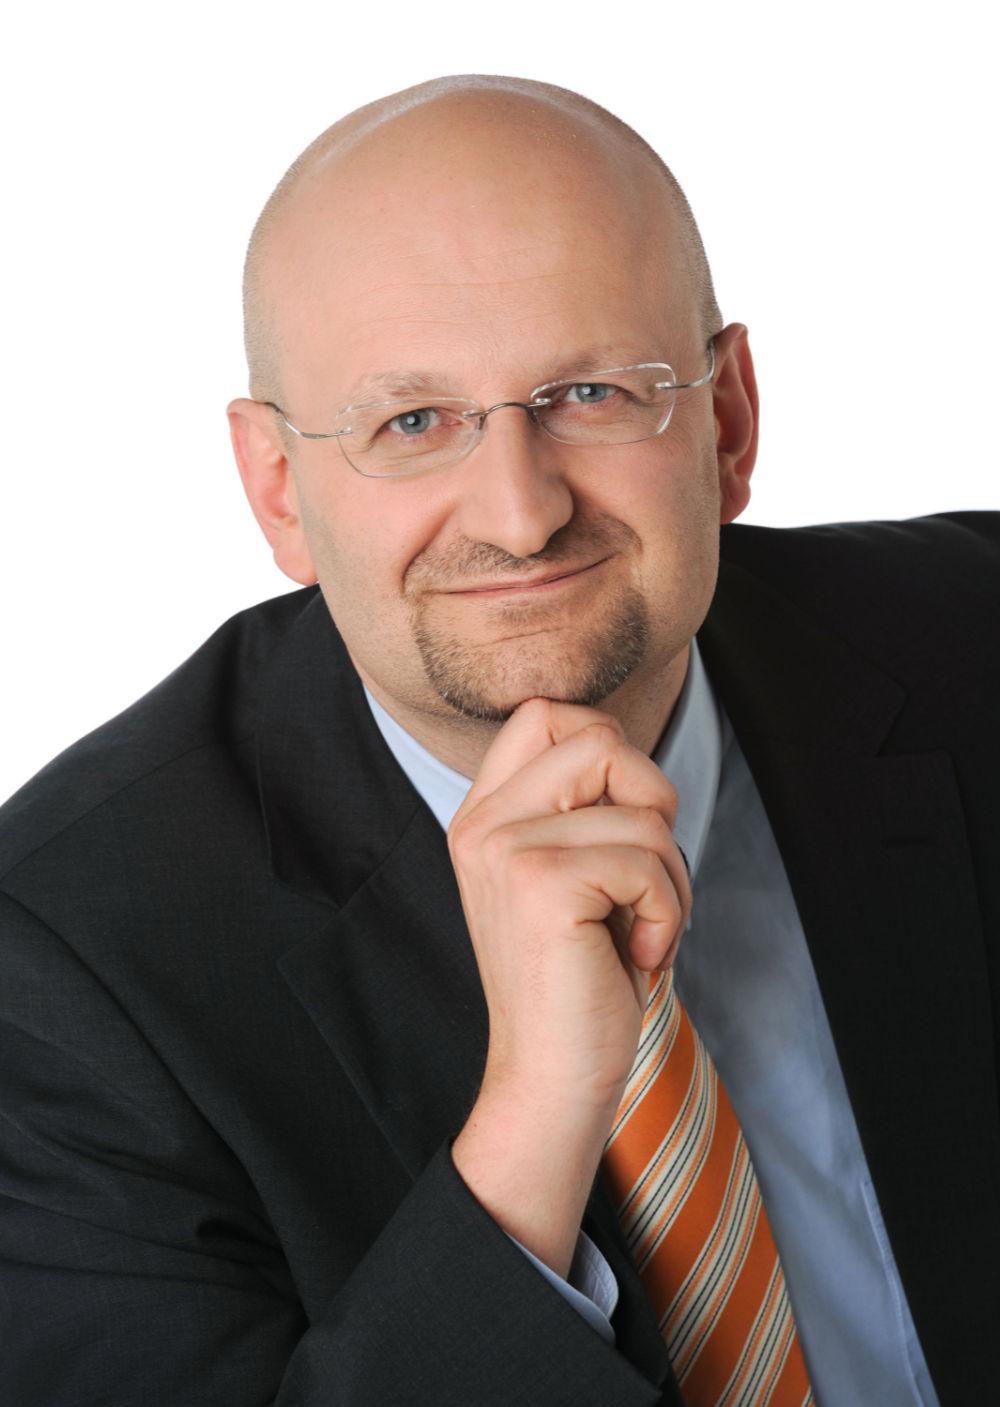 Peter Schöber